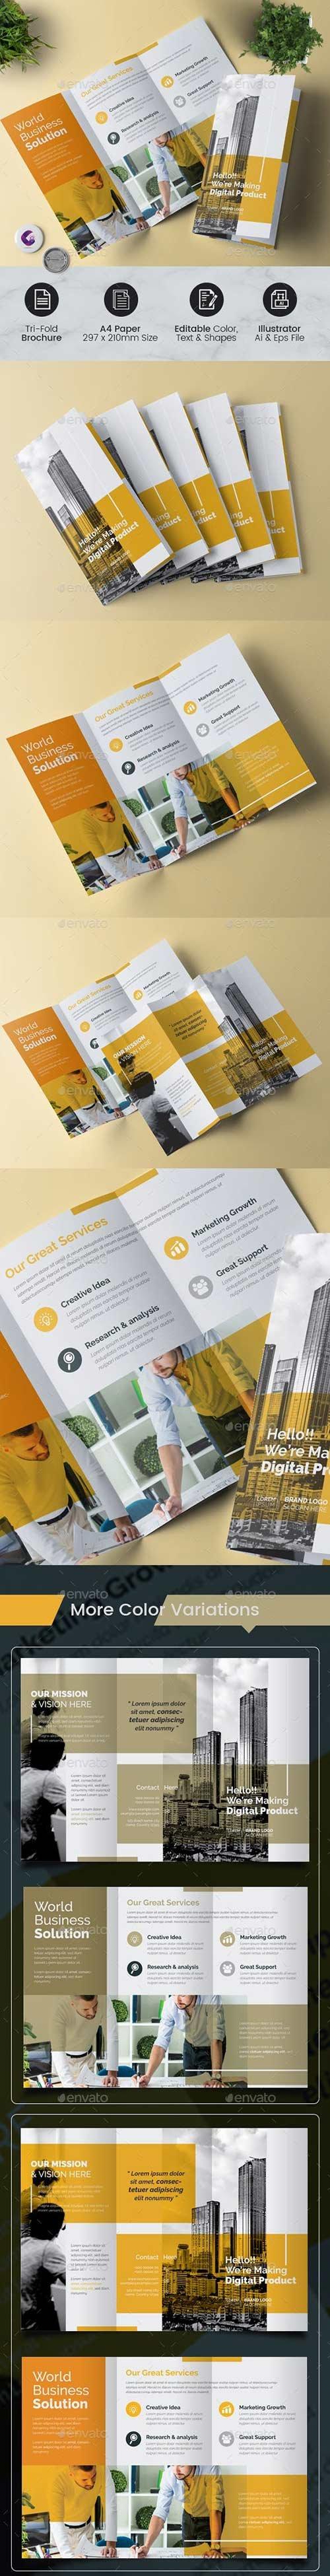 GraphicRiver - Minimal Trifold Brochure 23101005